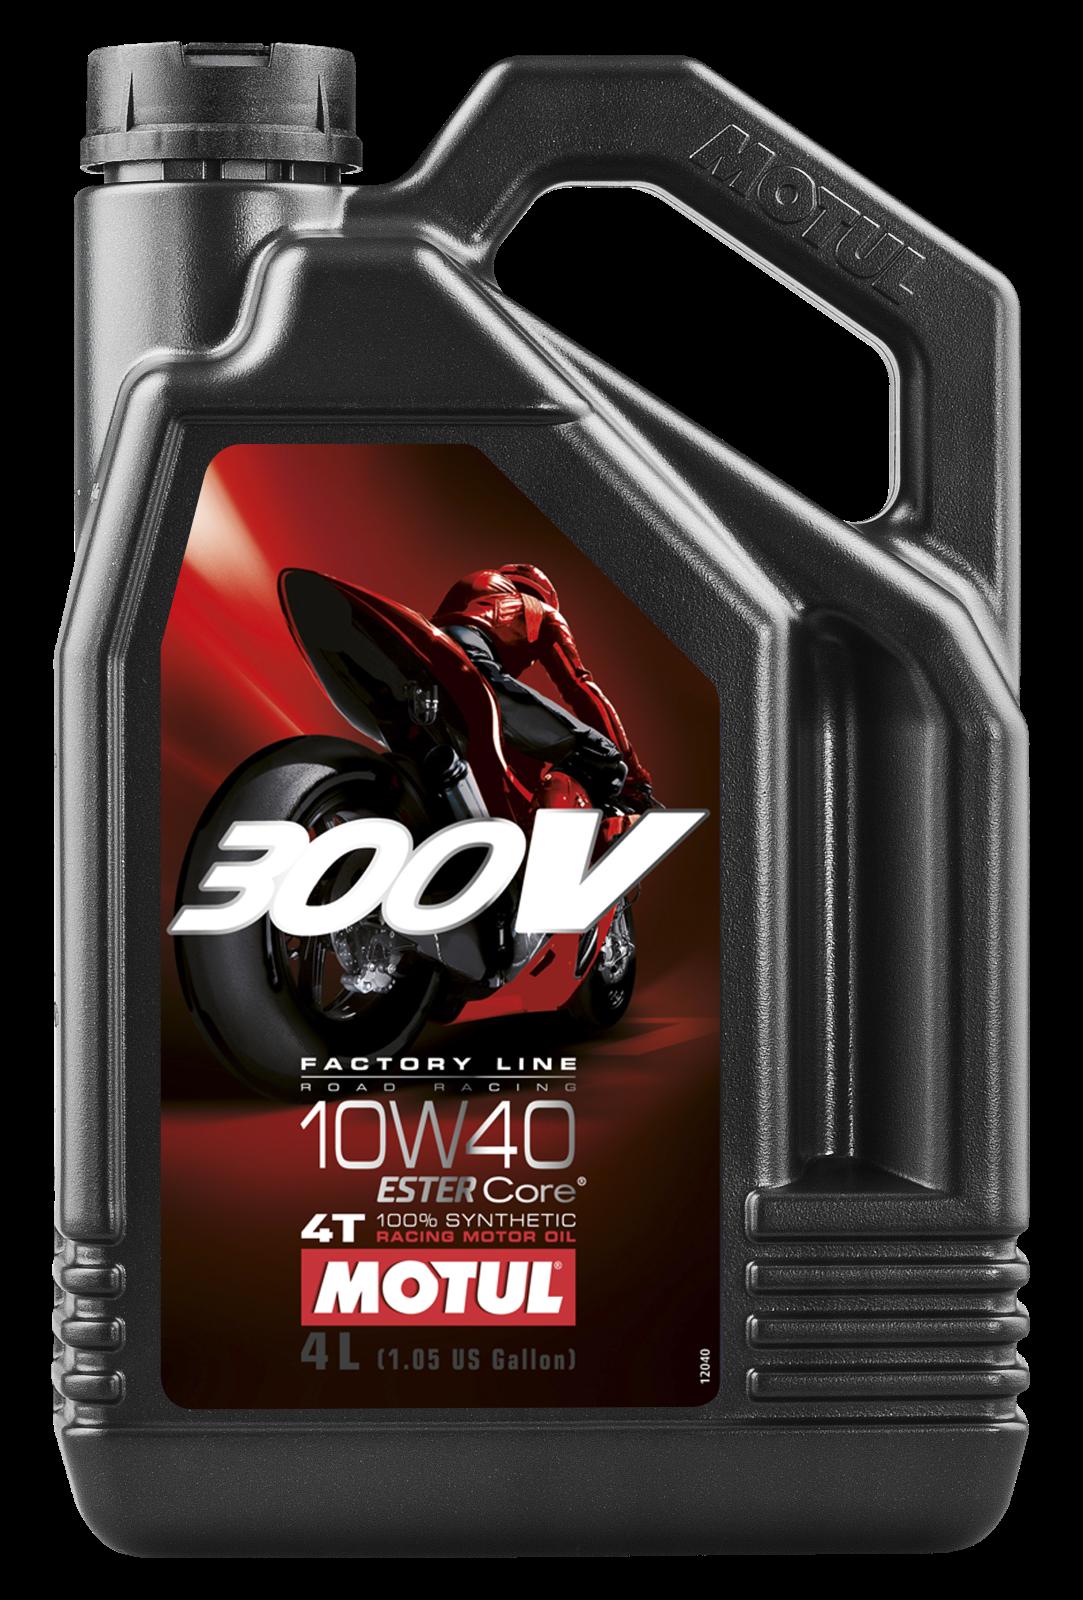 MOTUL AG MOTUL 300V 4T FACTORY LINE 10W-40 4L